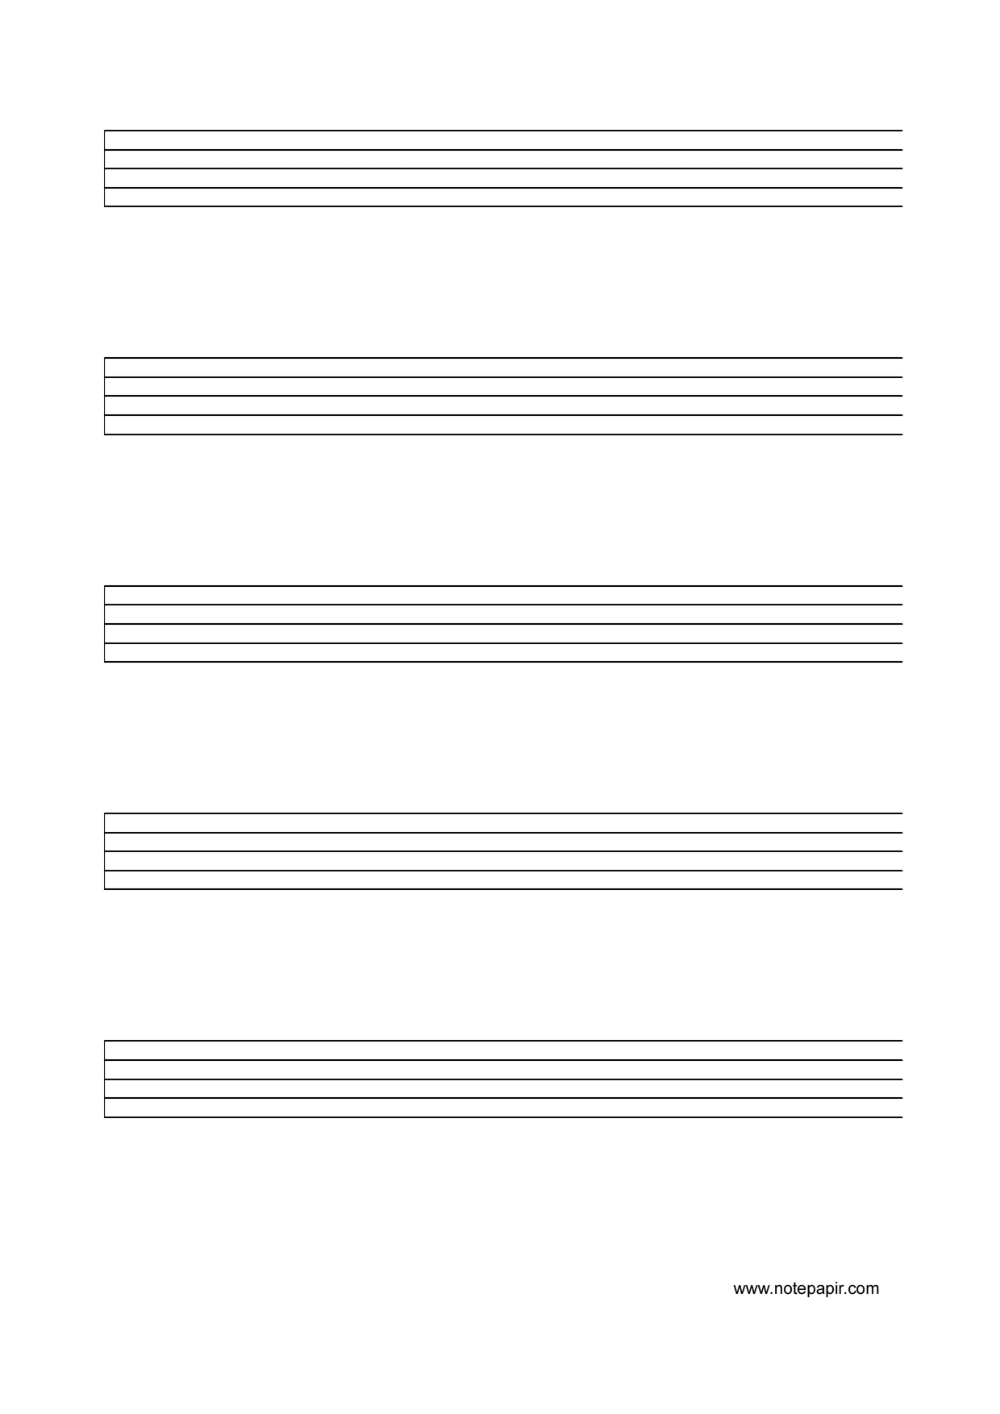 Free Printable Music Staff Paper Blank Sheet Music Sheet Music Free Printable Sheet Music